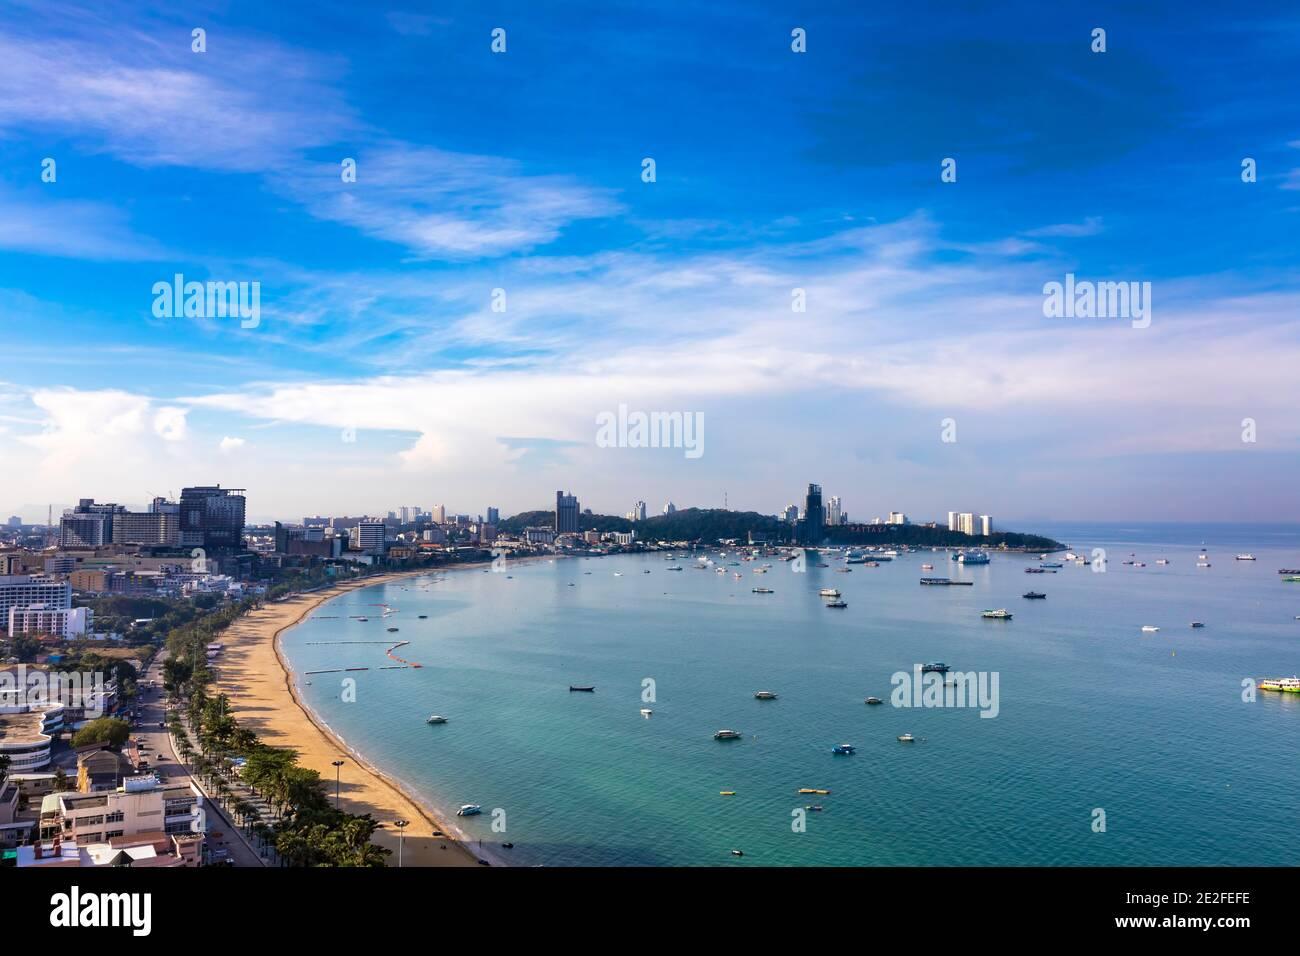 Pattaya paysage, Chon Buri, Thaïlande Banque D'Images